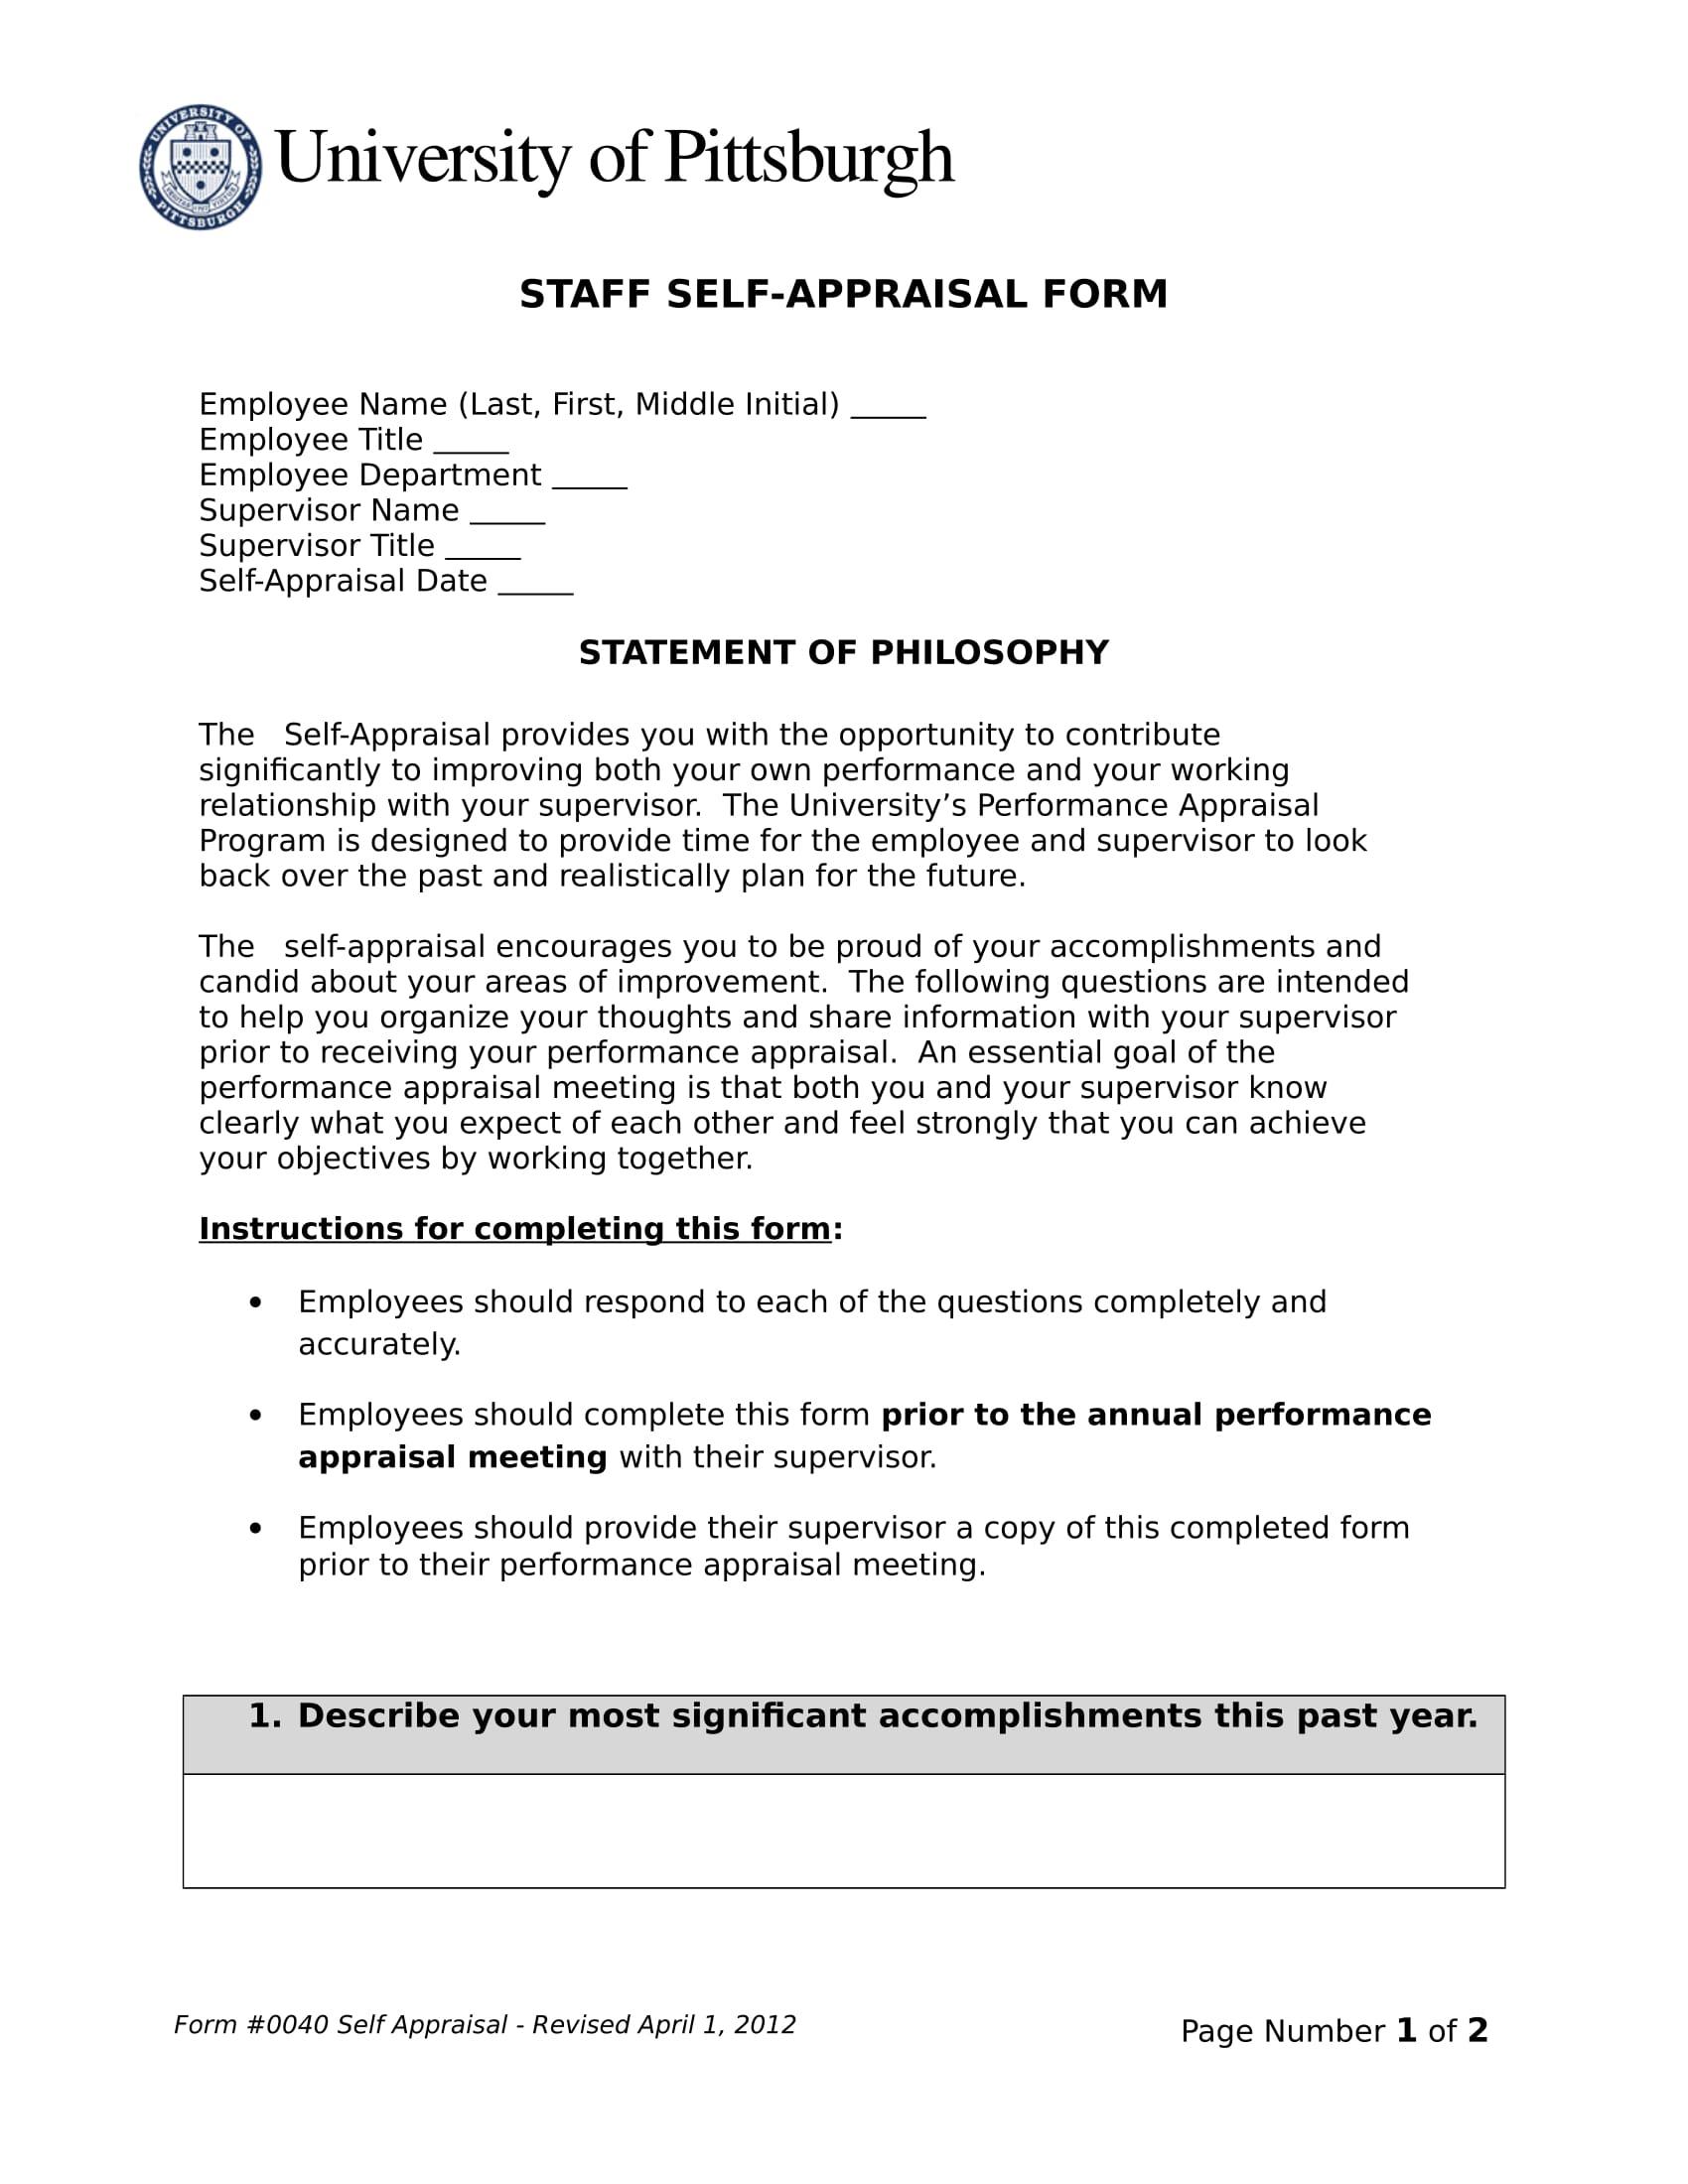 staff self appraisal form 1